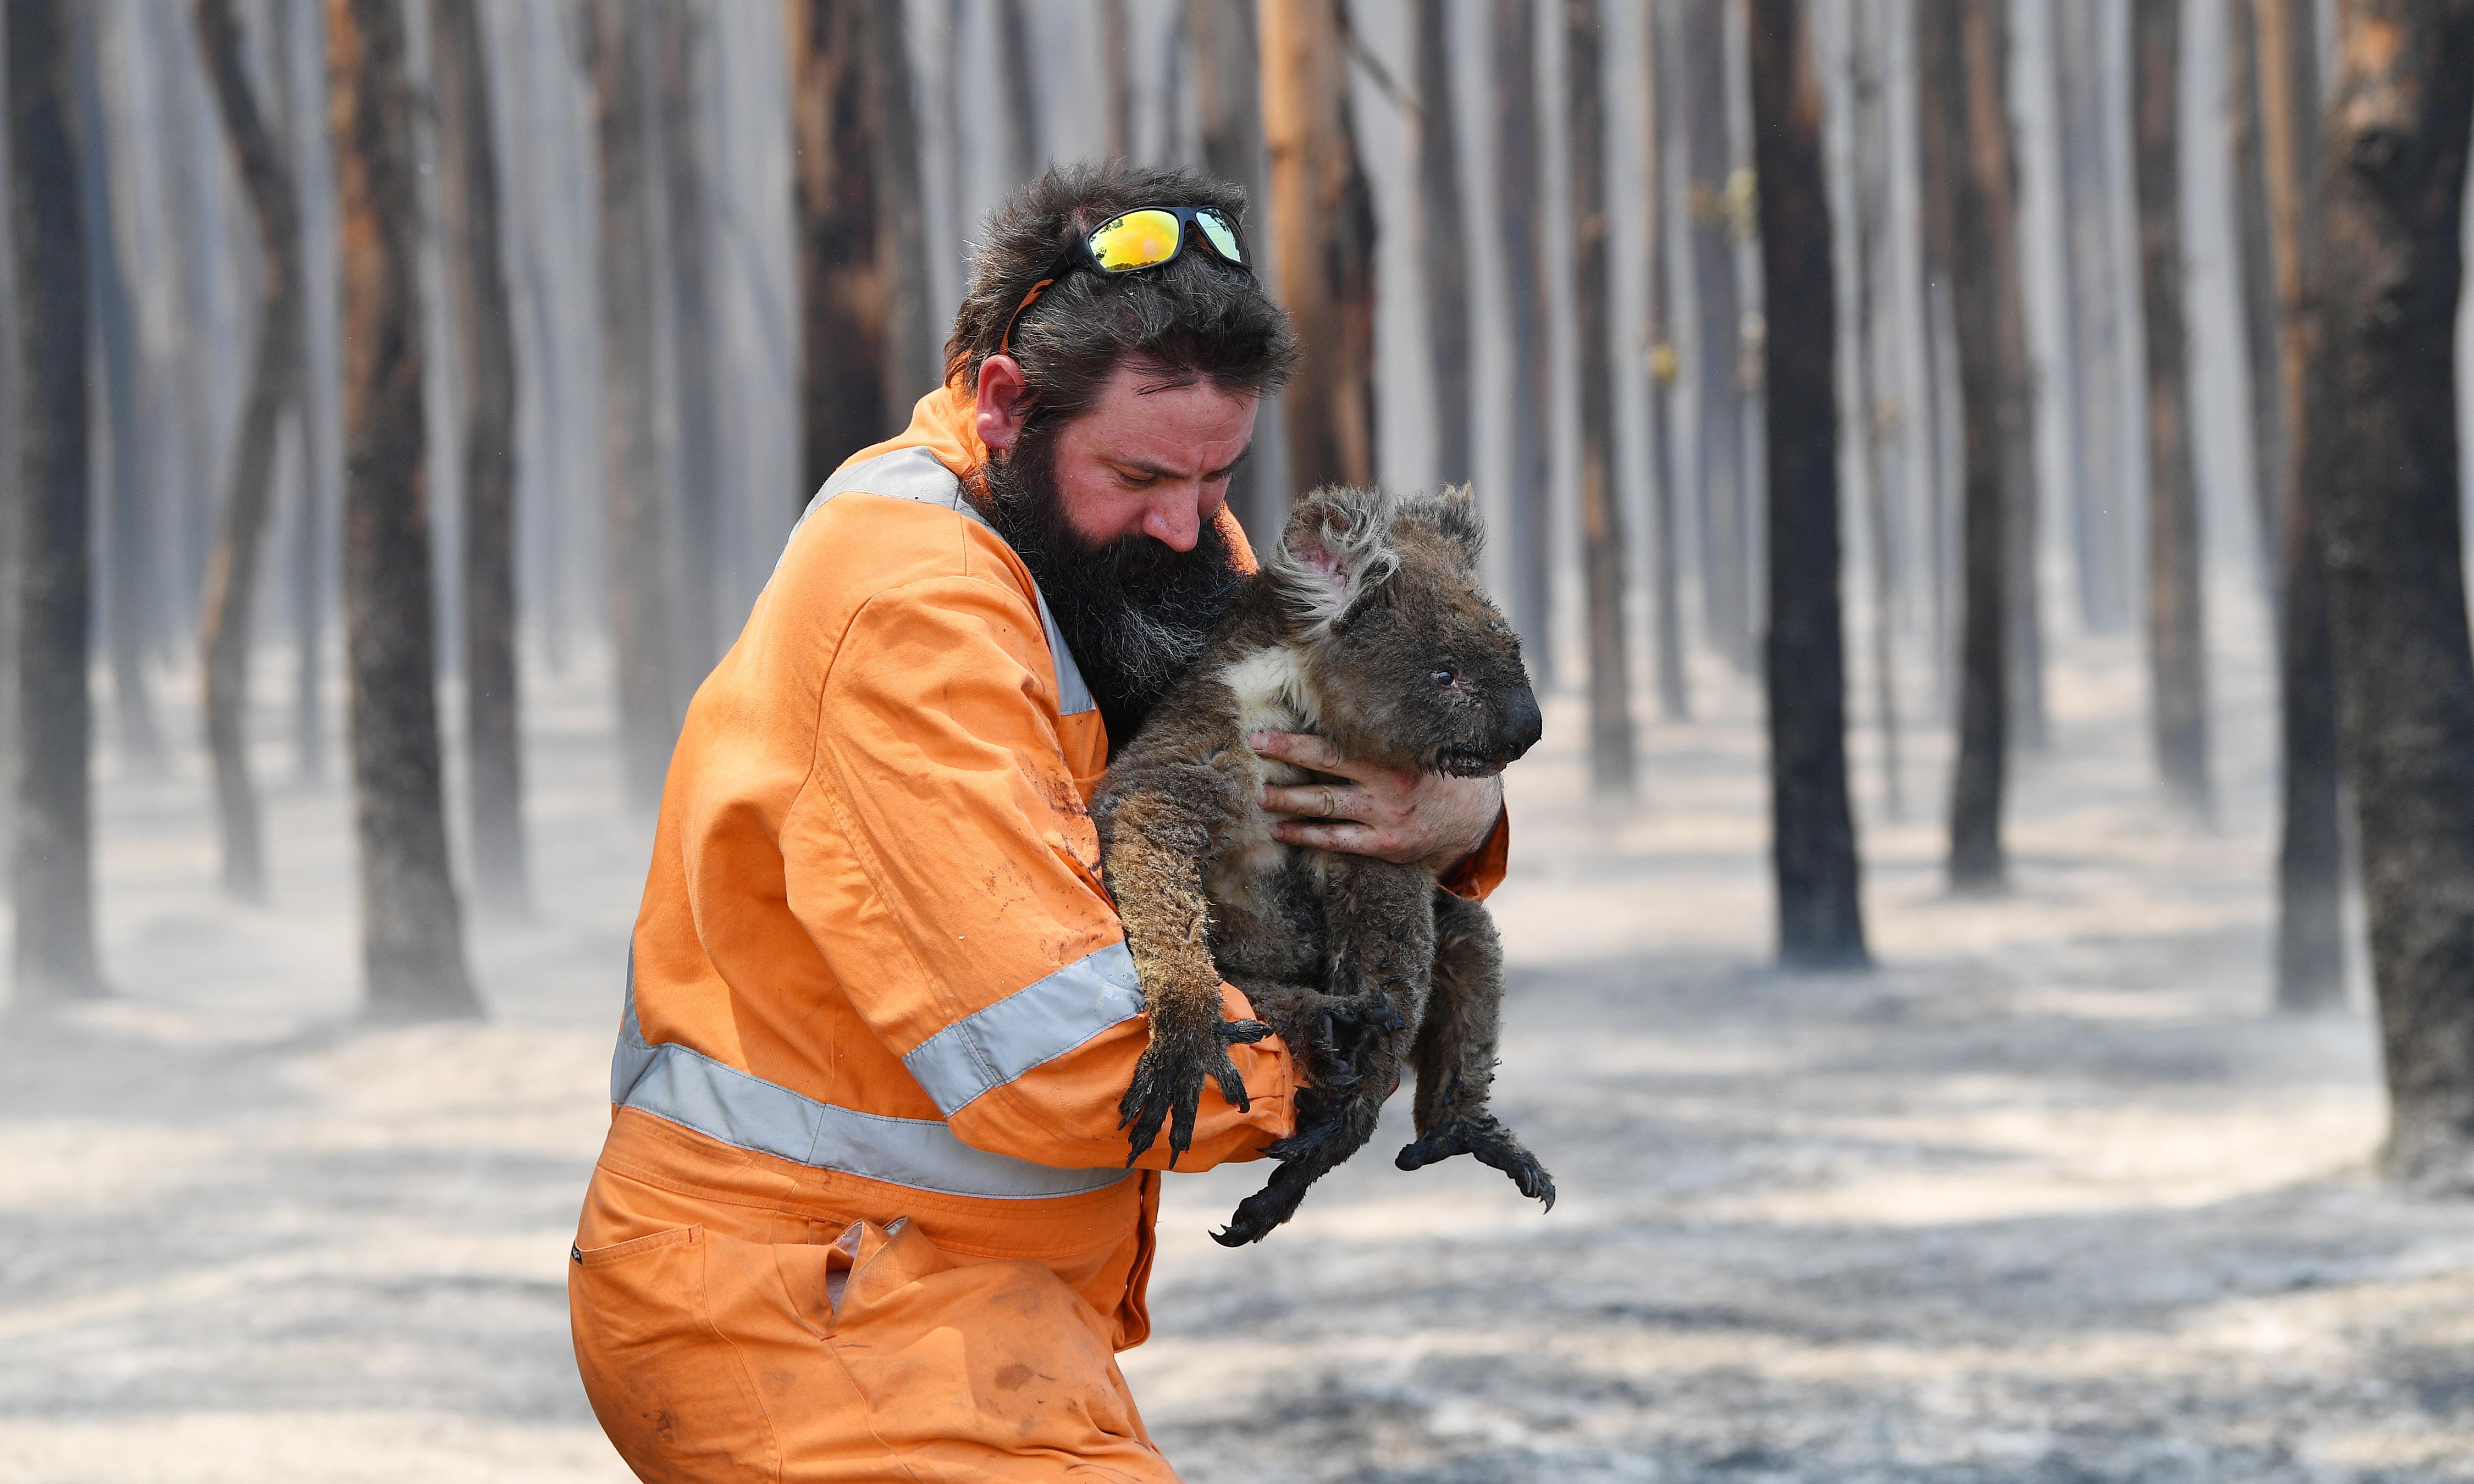 Kangaroo Island bushfires: grave fears for unique wildlife after estimated 25,000 koalas killed